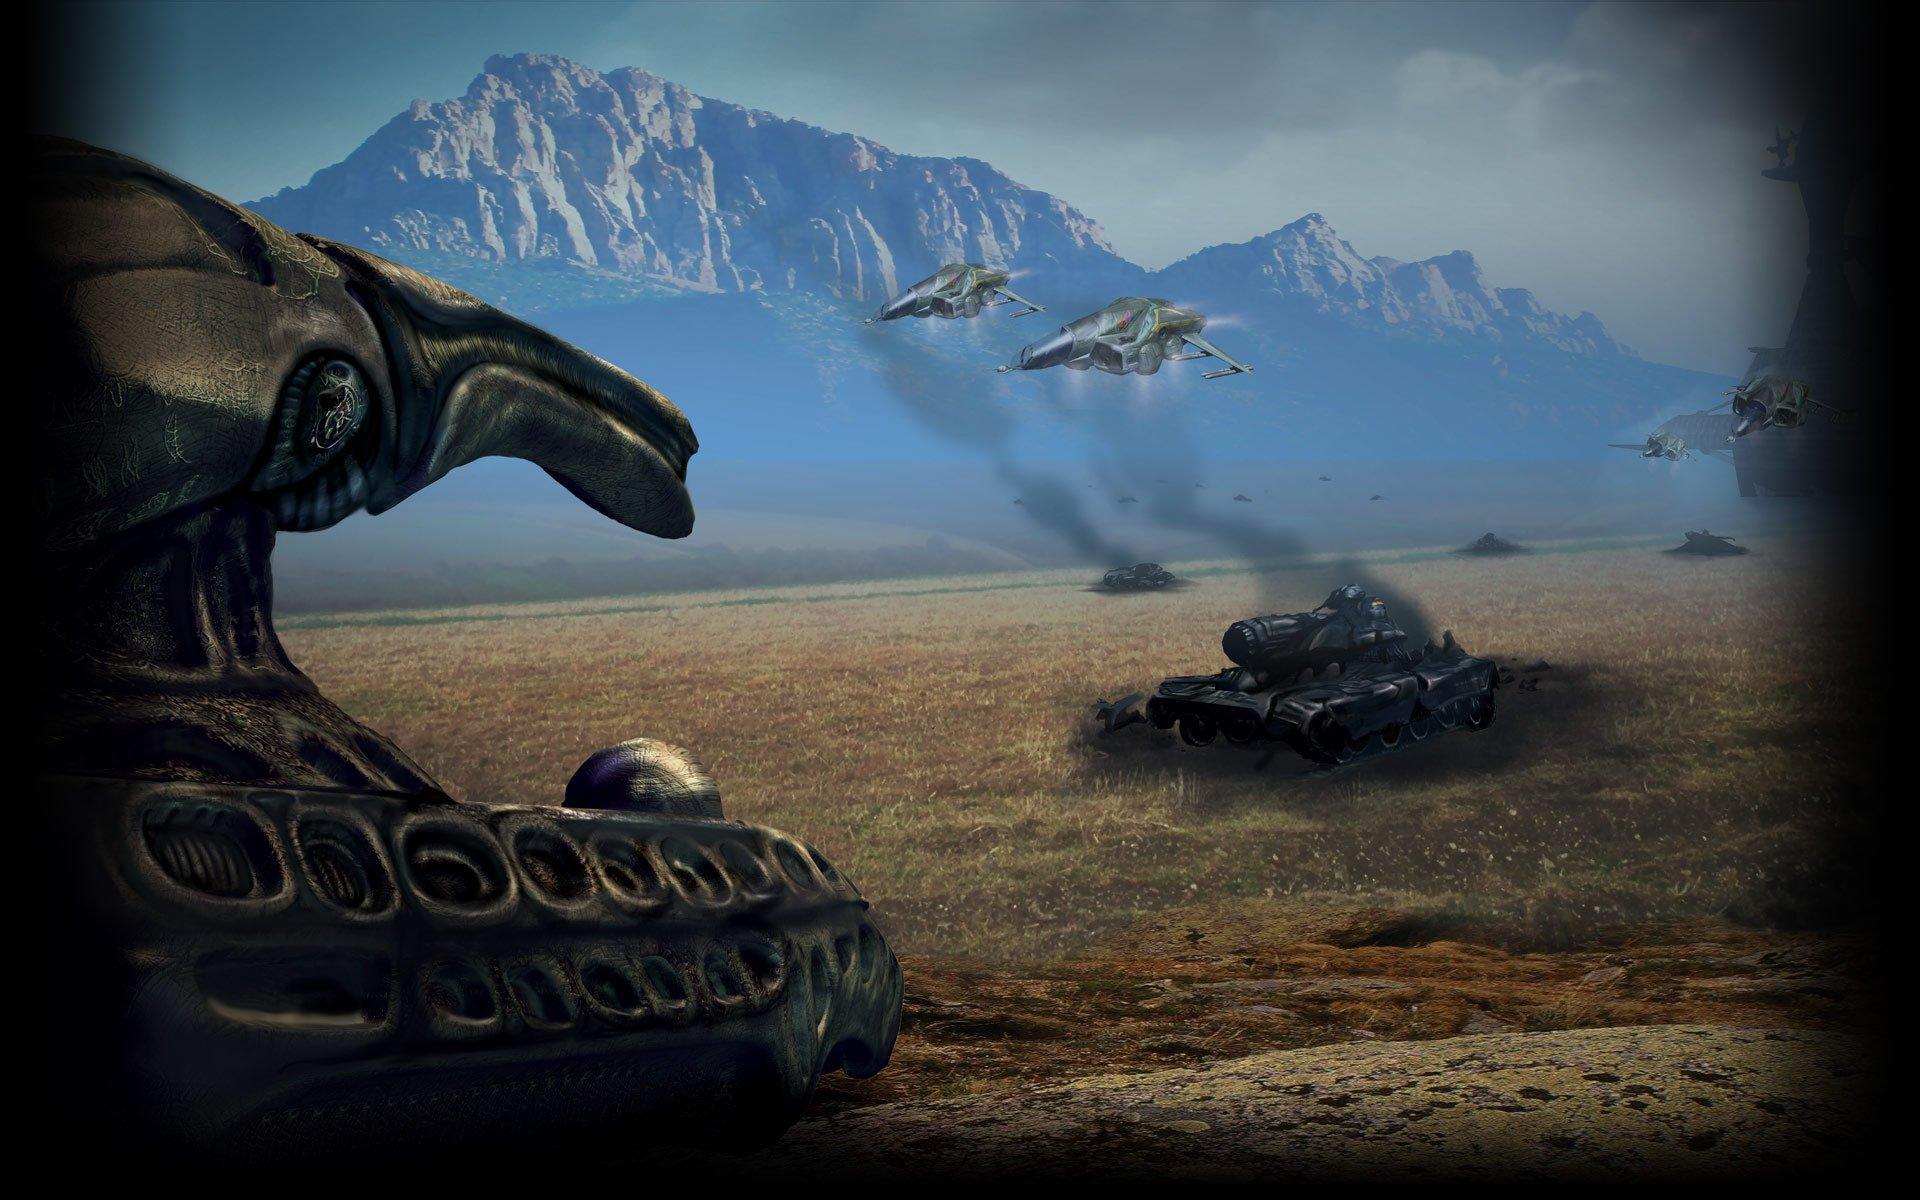 Echelon: Wind Warriors Full HD Wallpaper And Background